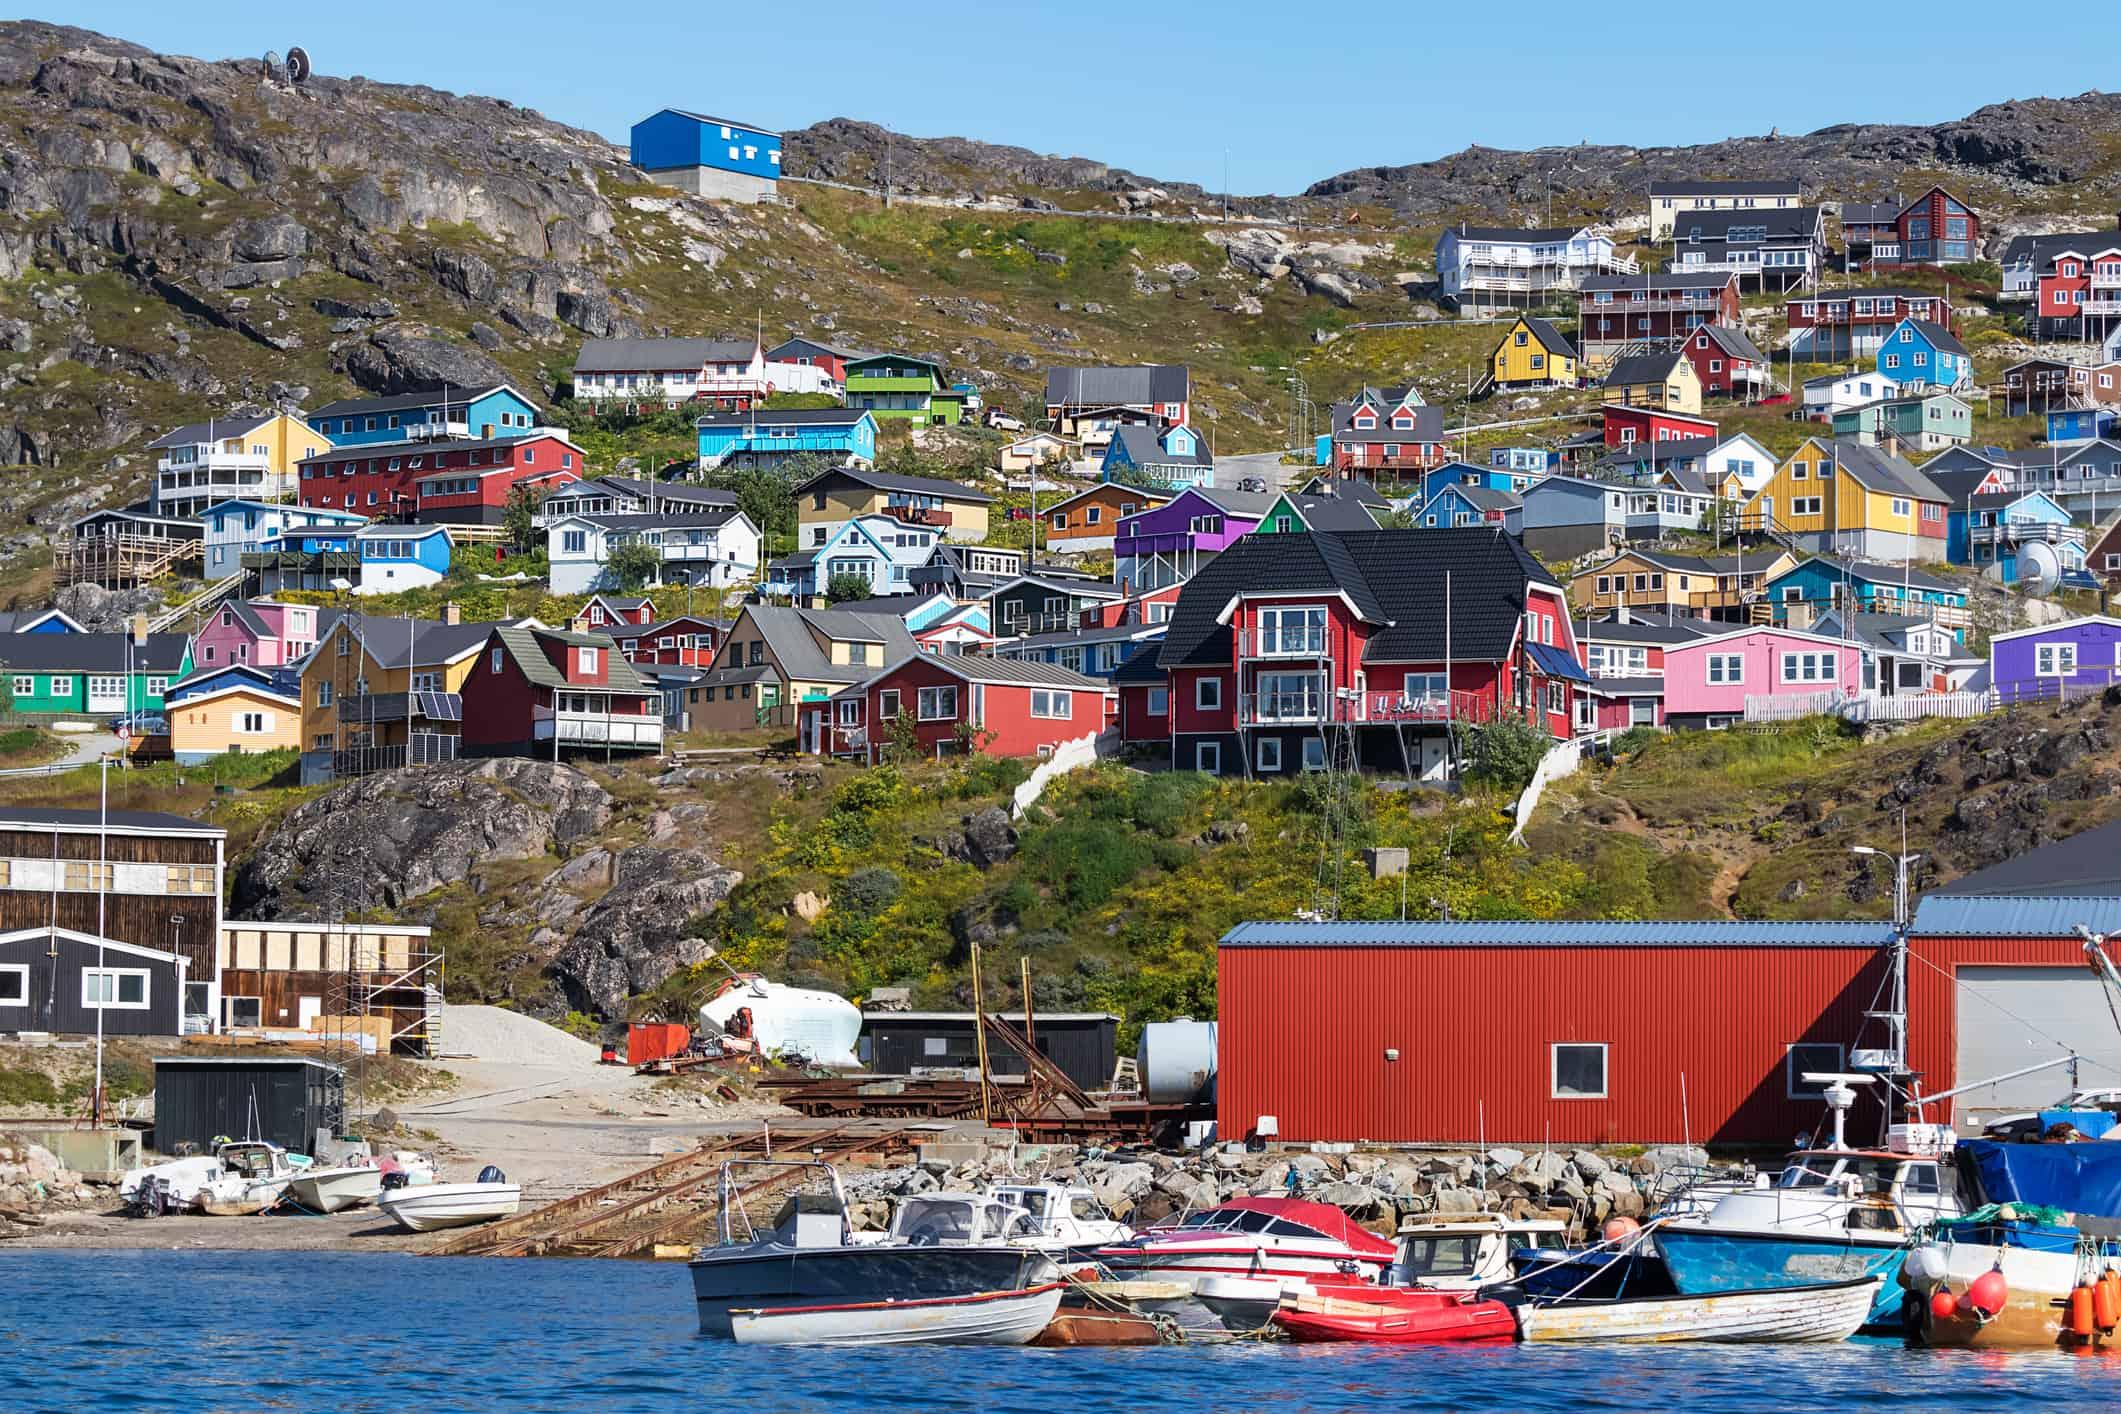 Colored houses on rocky hills in the coastline of Qaqortoq, Greenland.